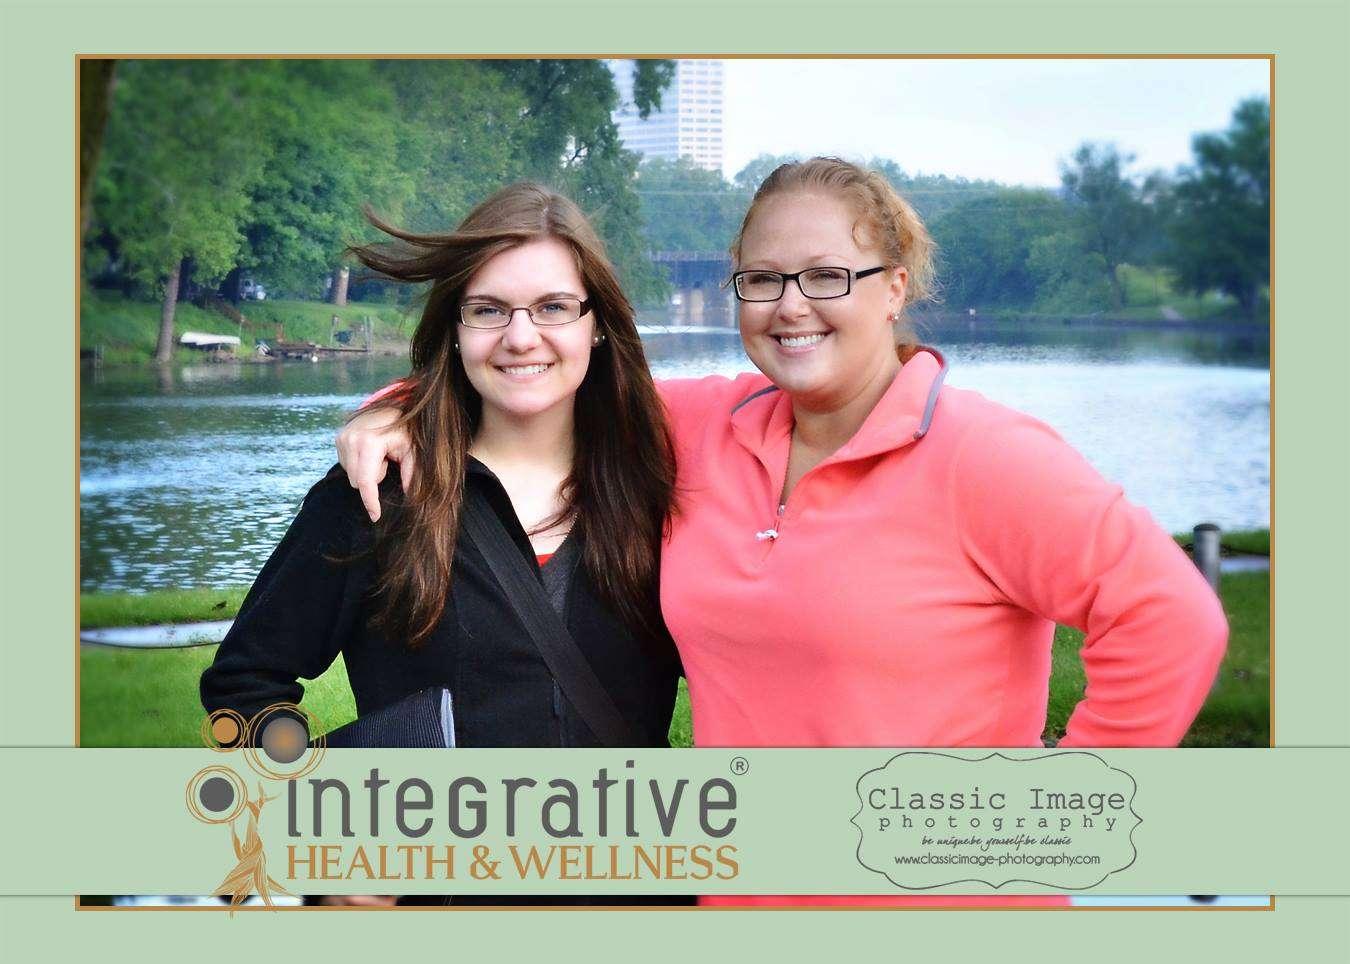 Integrative Health and Wellness Bike the Bend